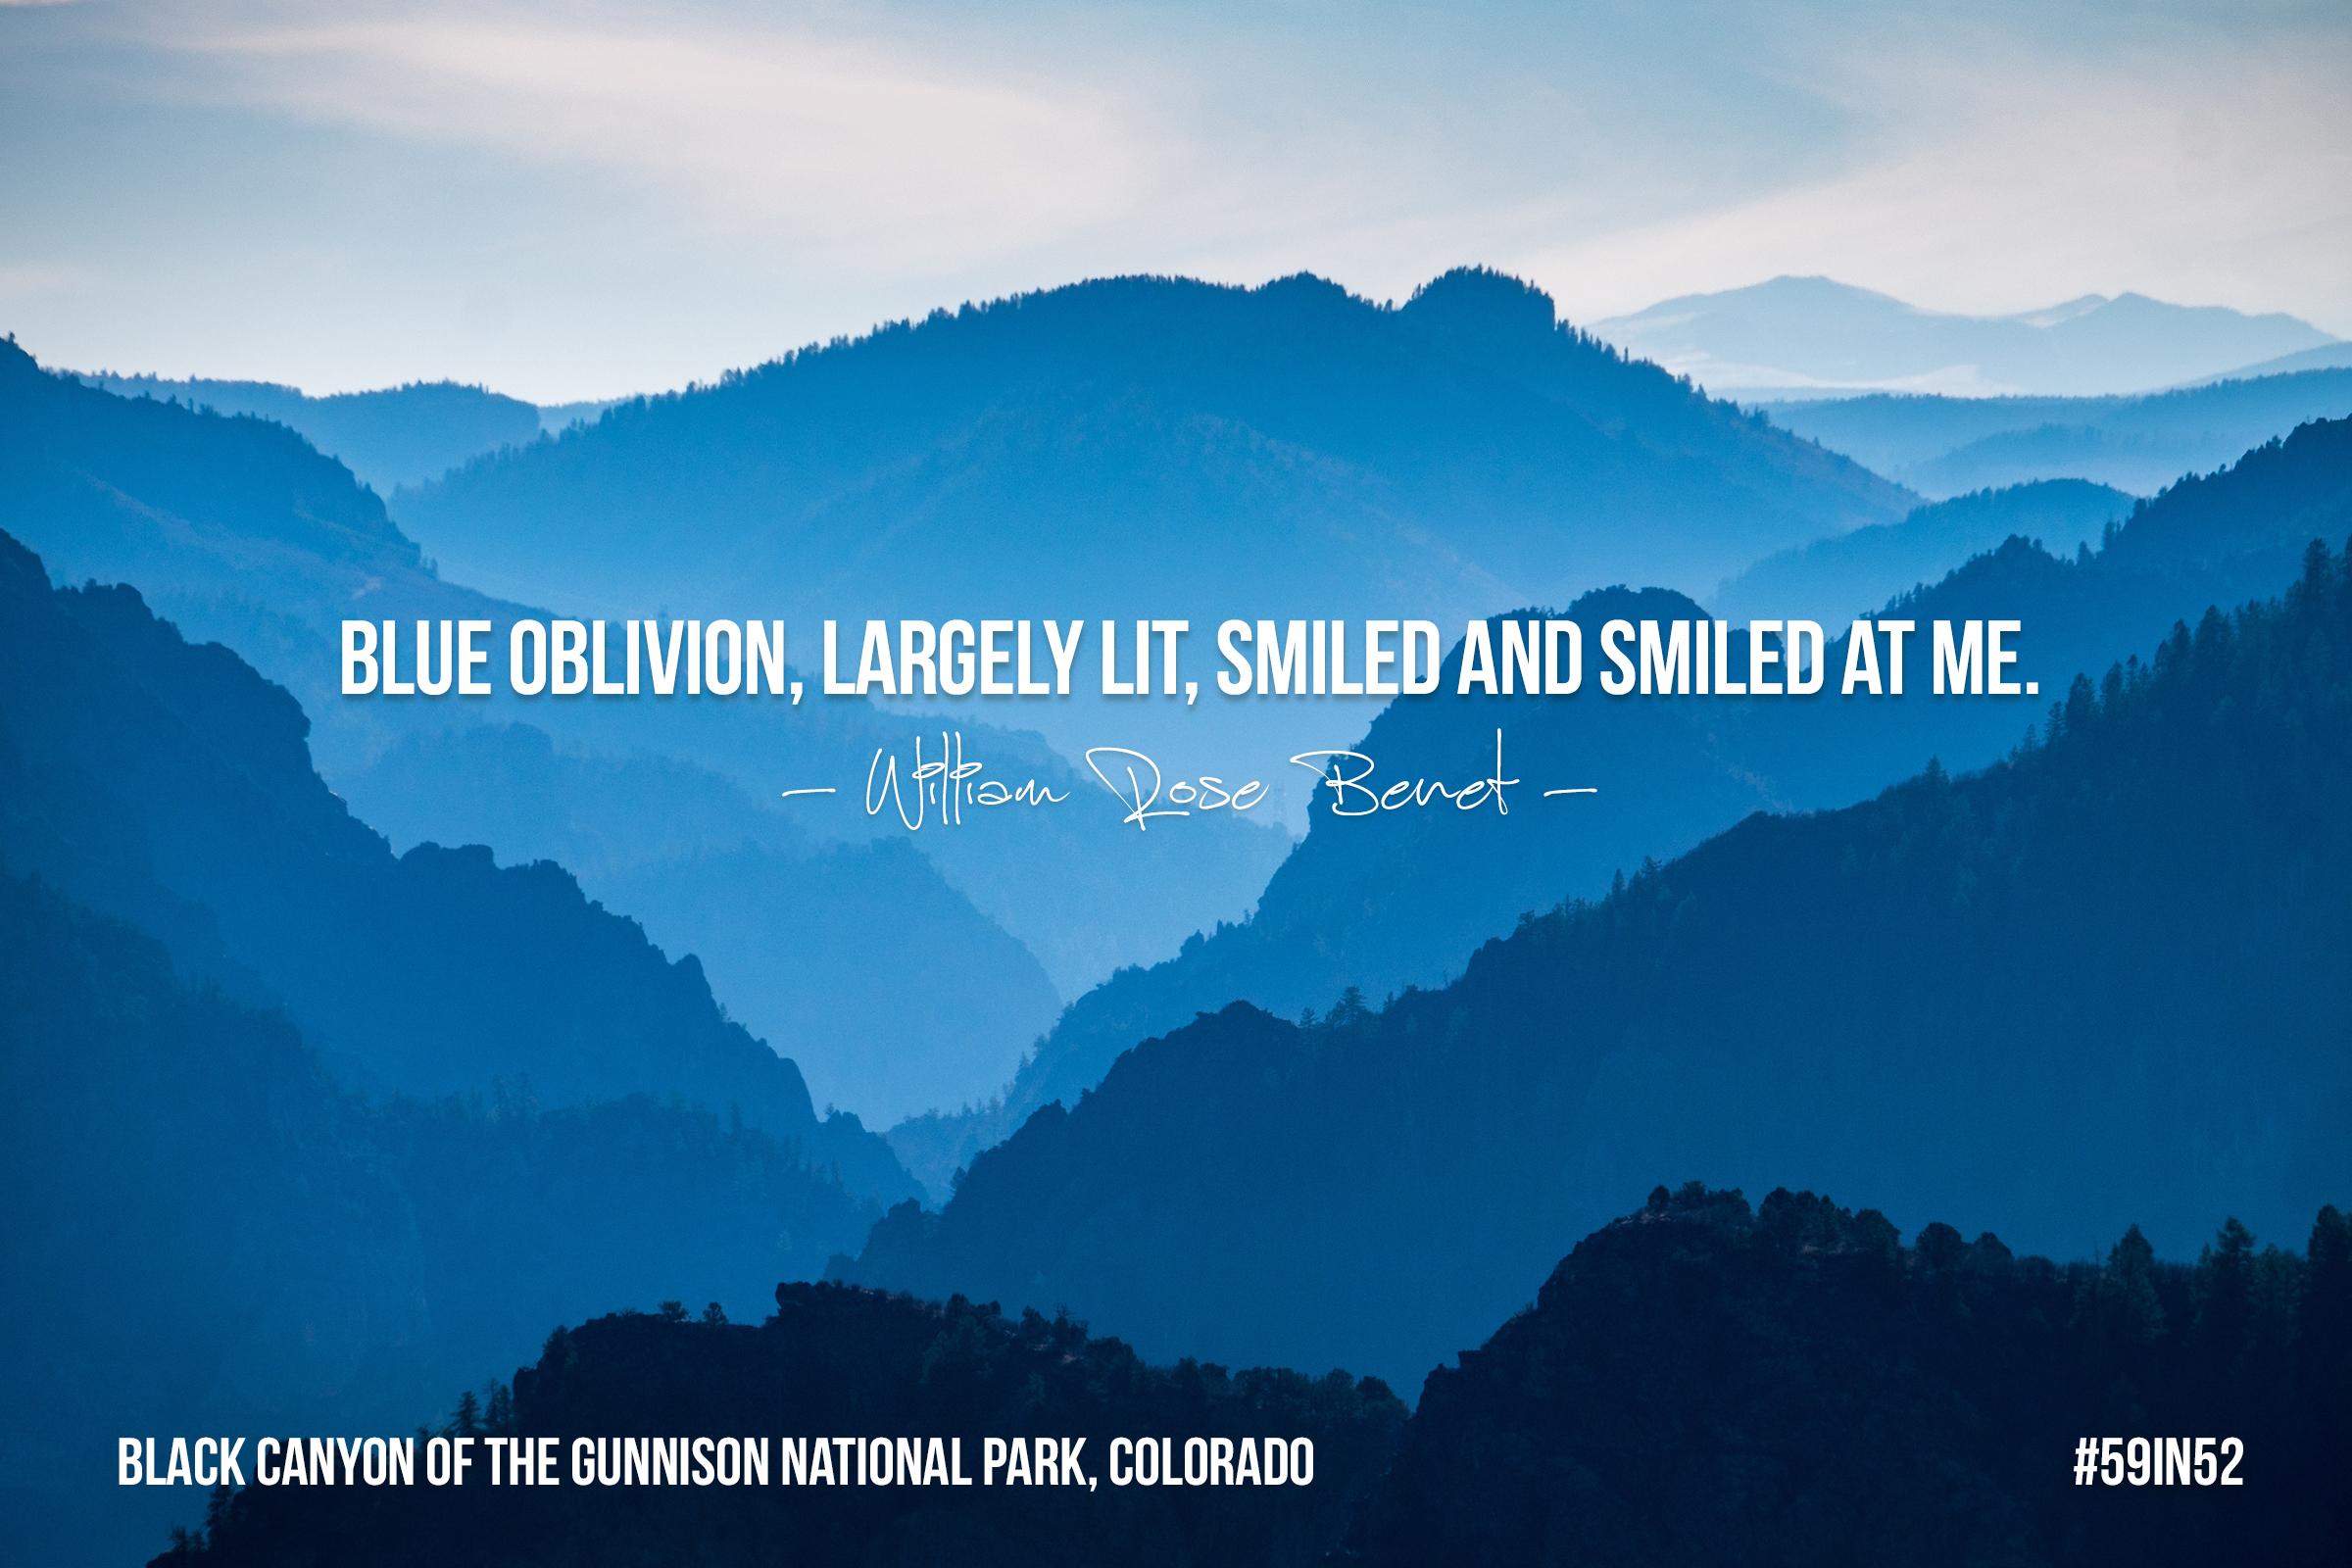 """Blue oblivion, largely lit, smiled and smiled at me."" -William Rose Benet"